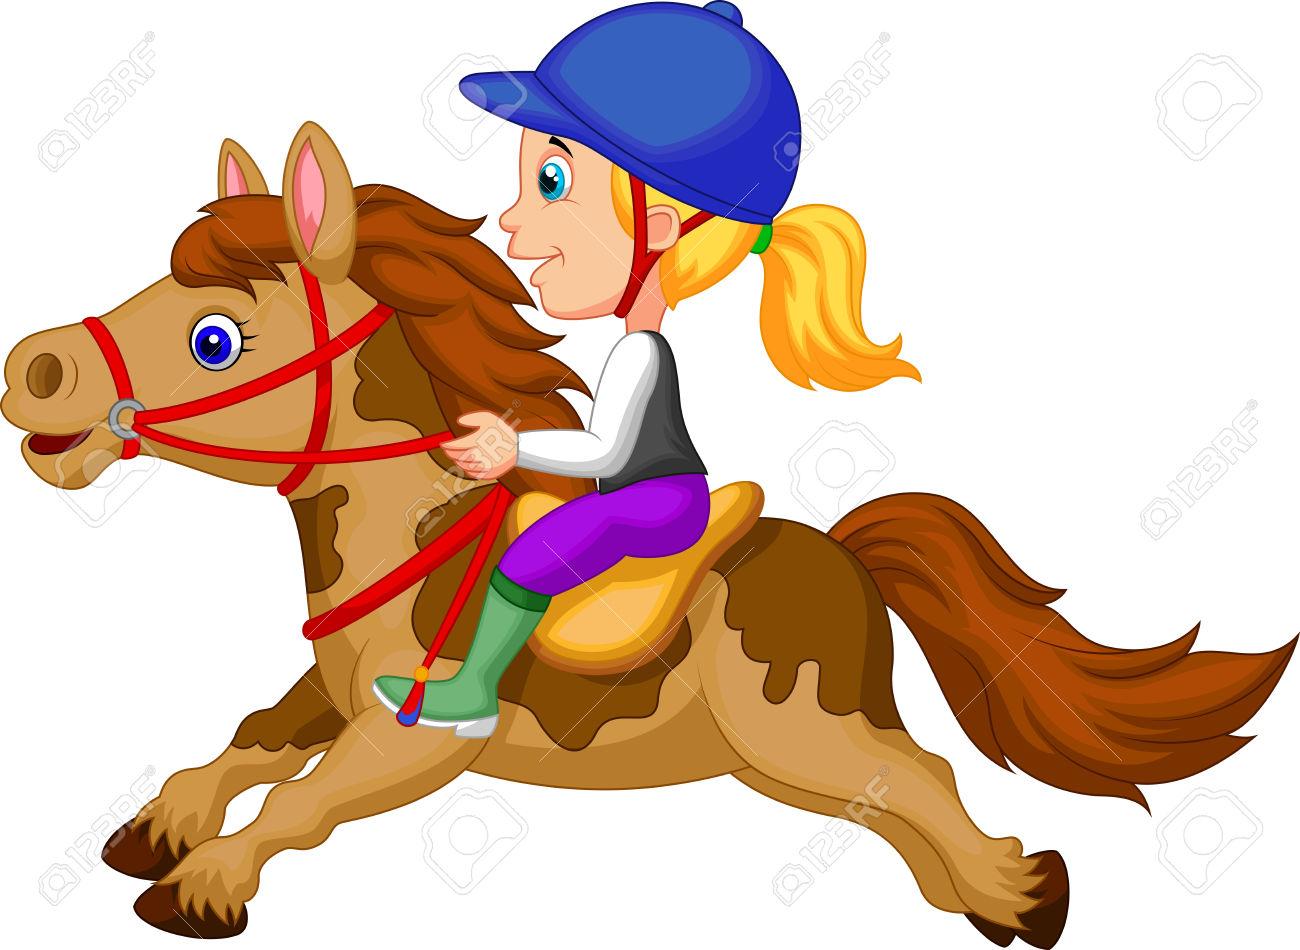 4,020 Horseback Riding Stock Illustrations, Cliparts And Royalty.